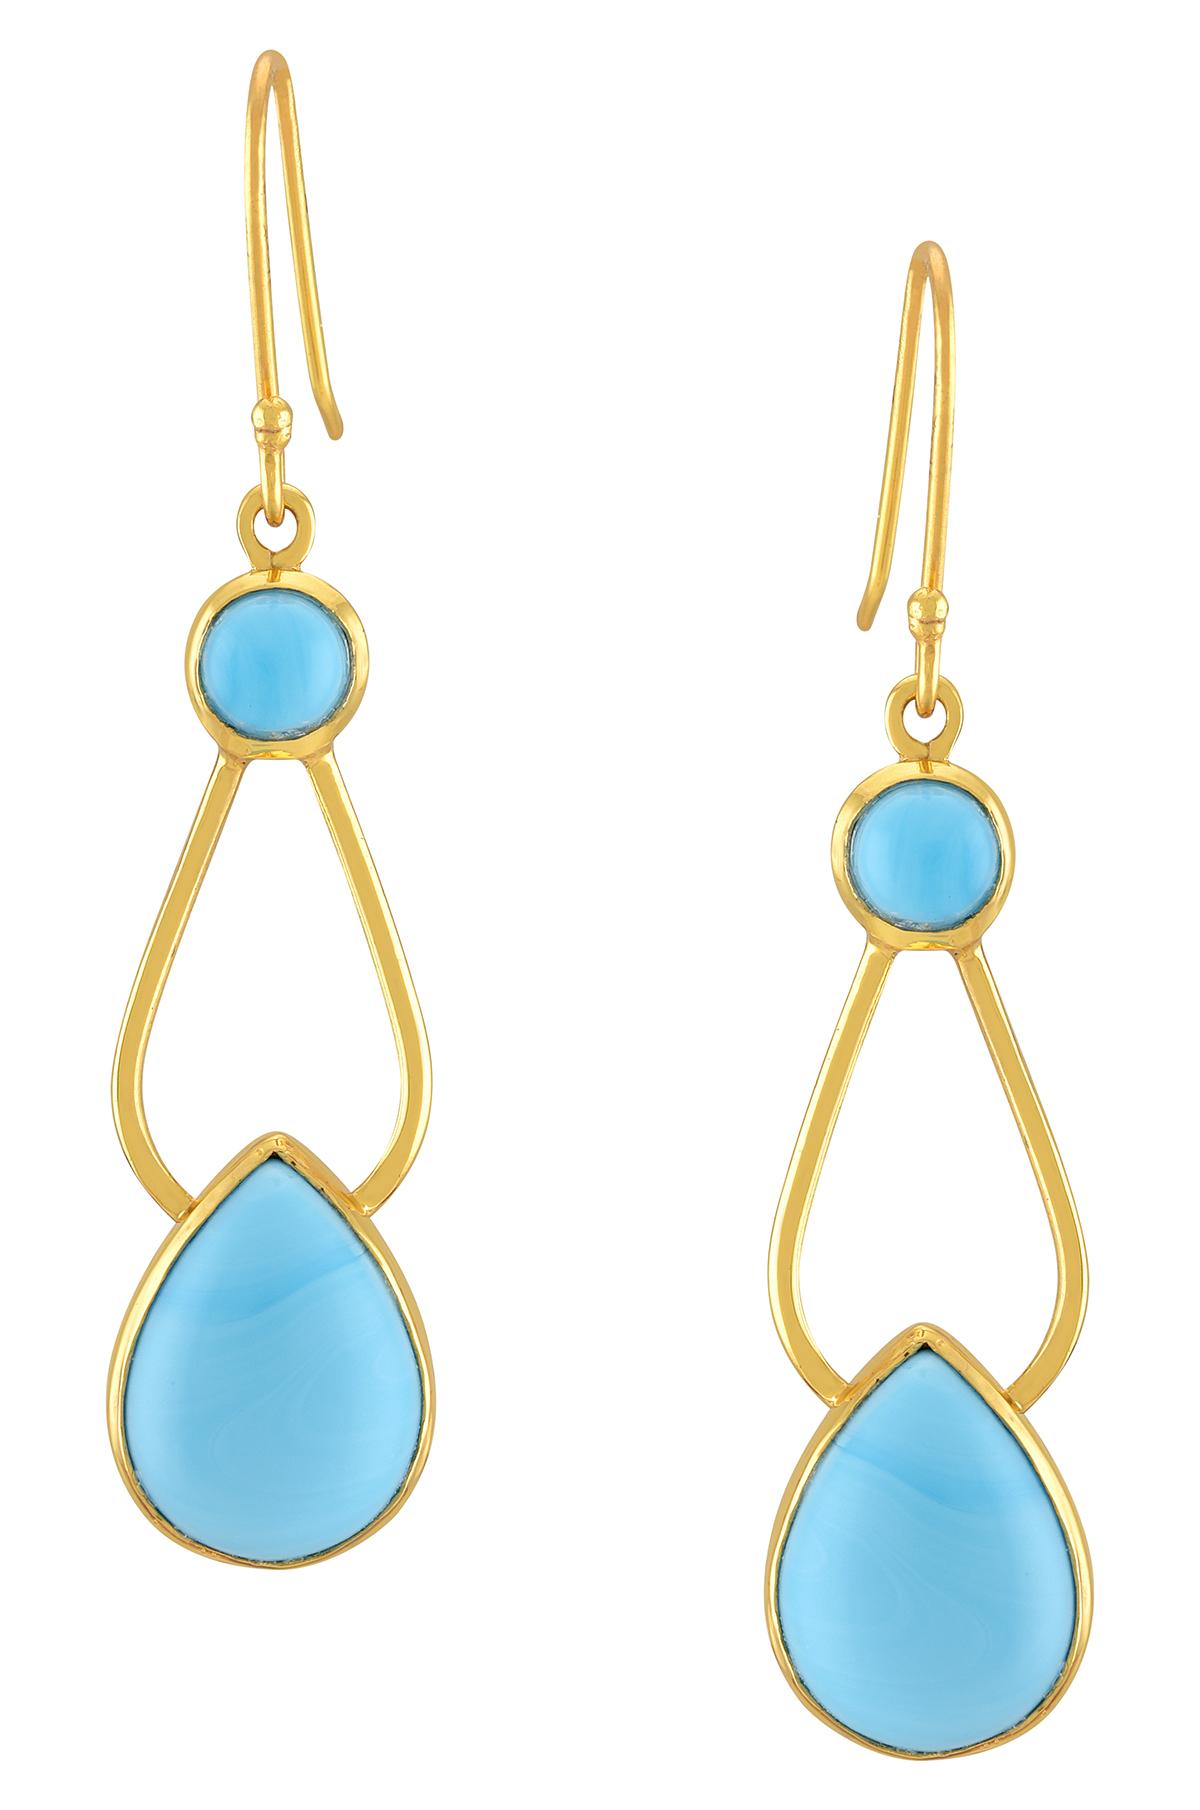 Gold Plated Pear Dangle Earrings